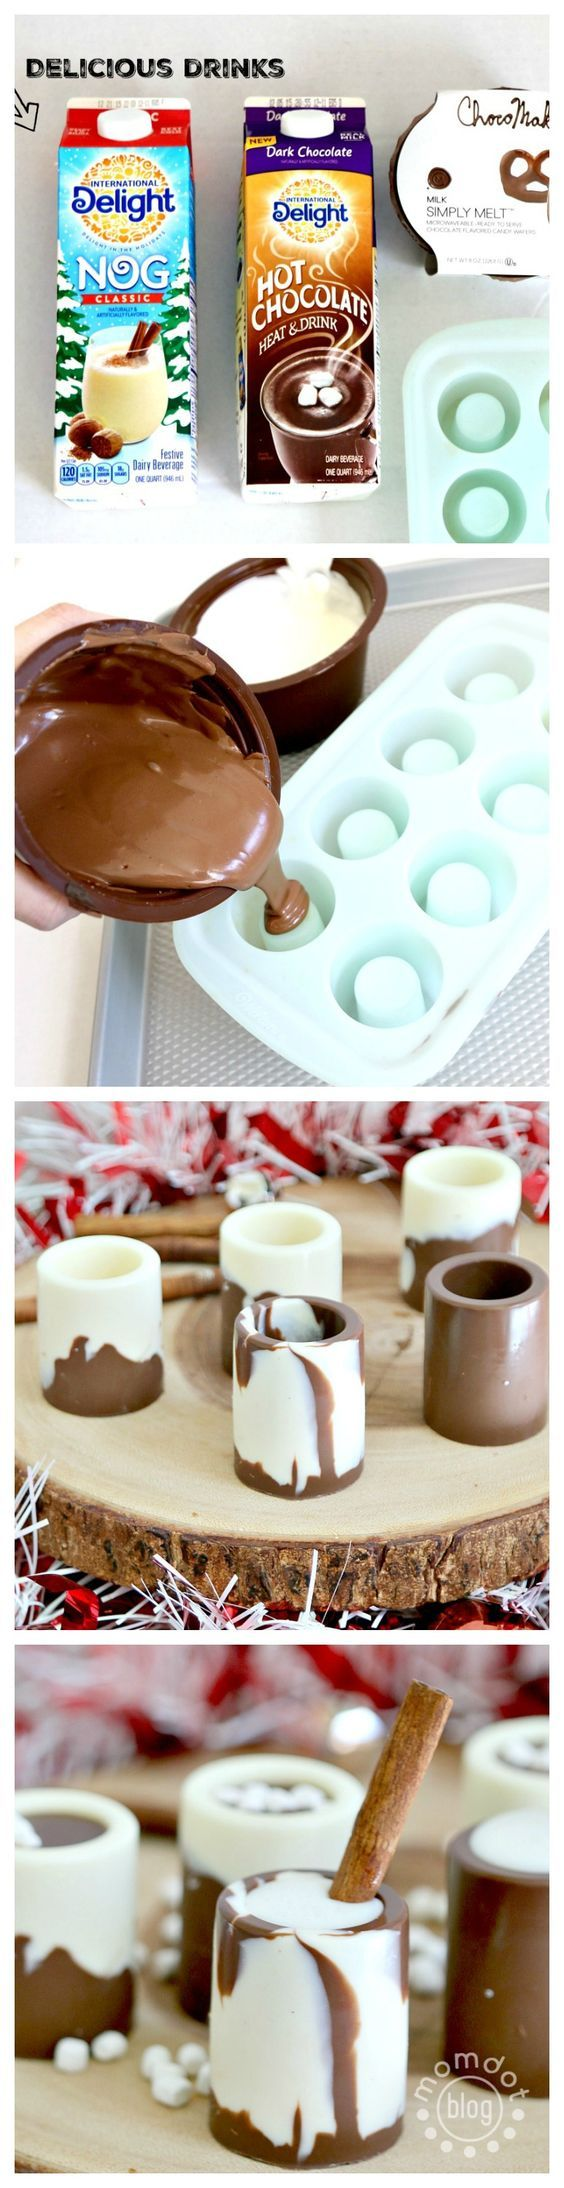 Egg Nog and Chocolate Shooters, How to make Egg Nog Shot glasses like a boss !: